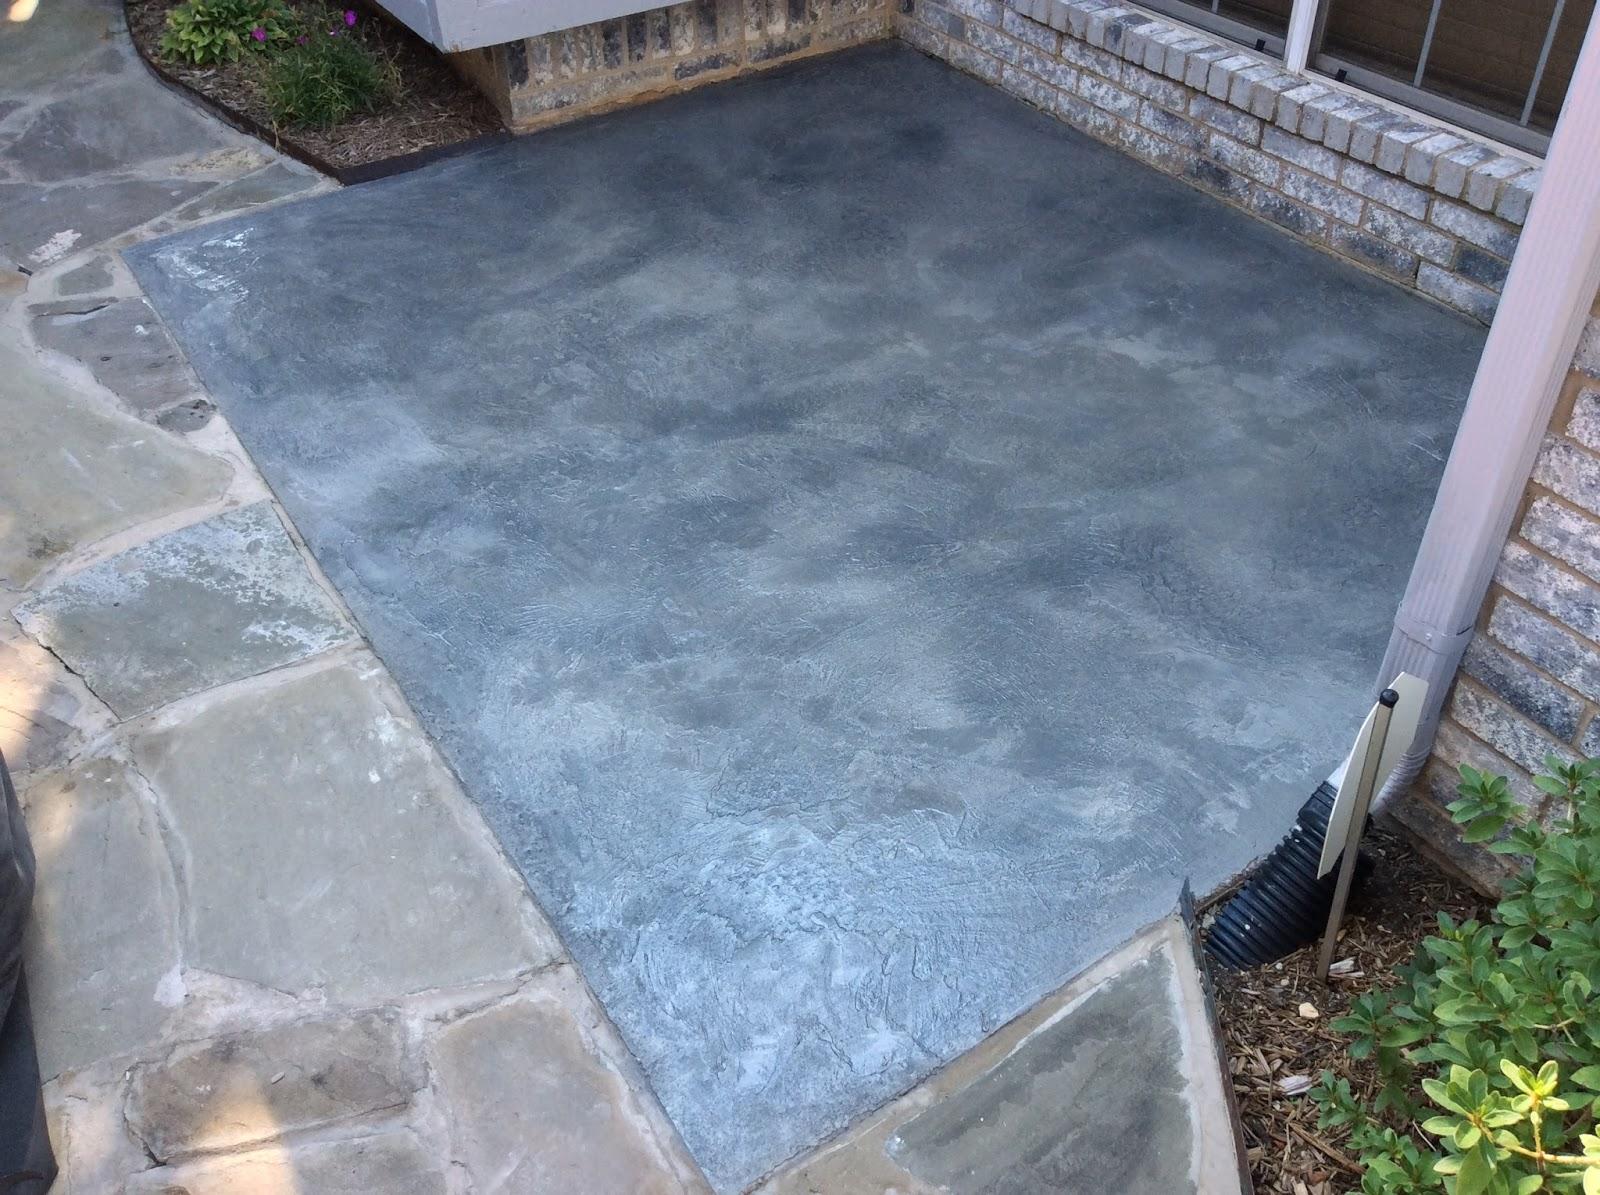 Epoxy Floor Coatings: Concrete patio resurfacing and ...